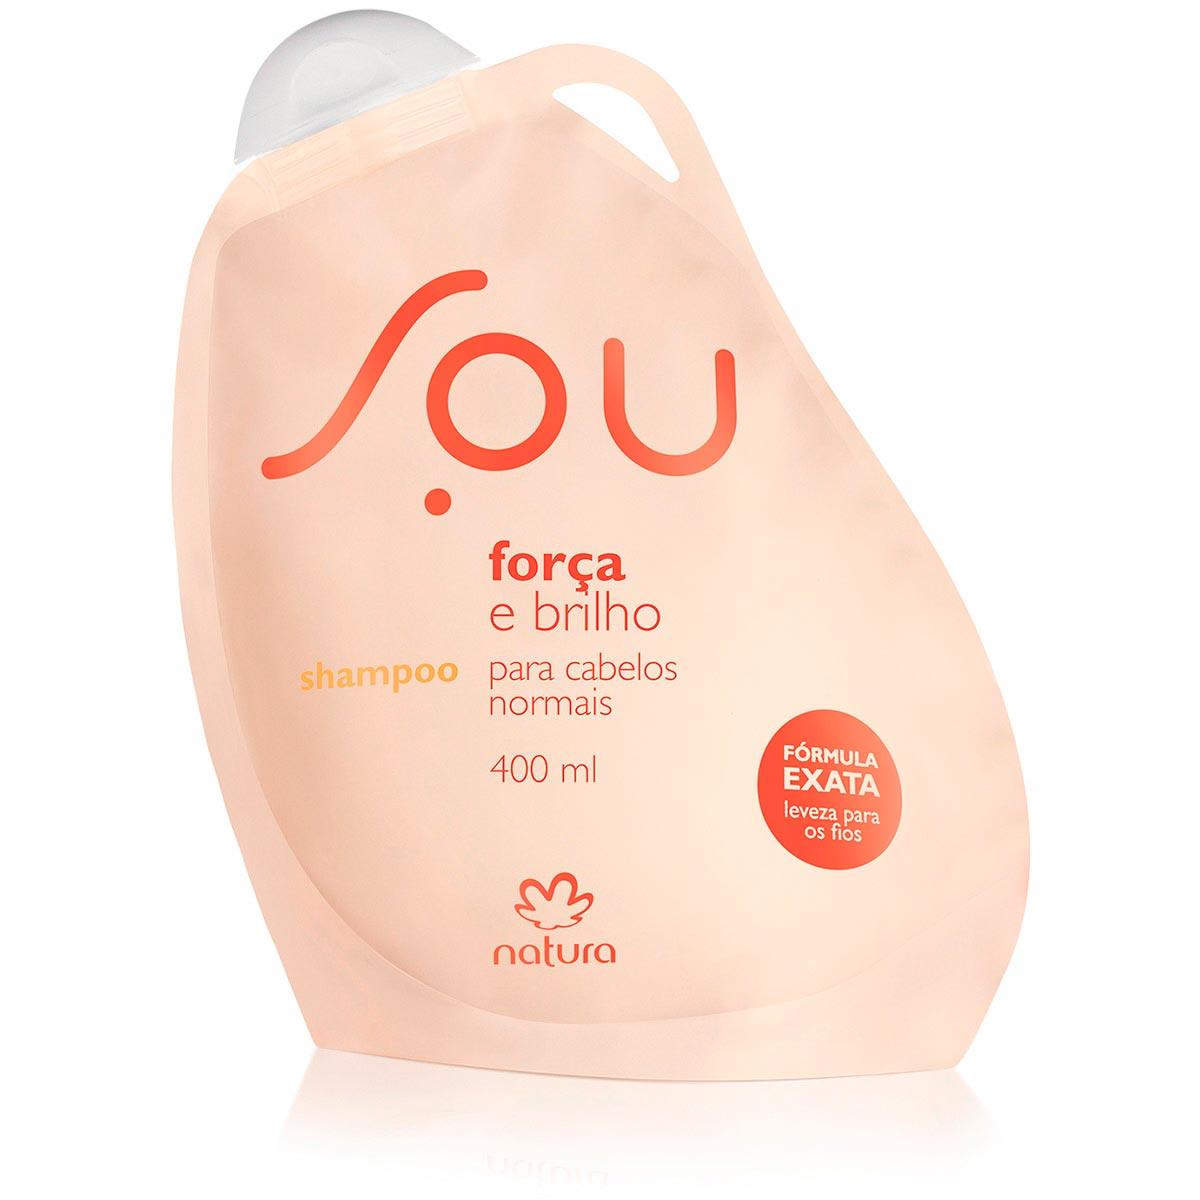 Shampoo Força e Brilho SOU - 400ml - 63906